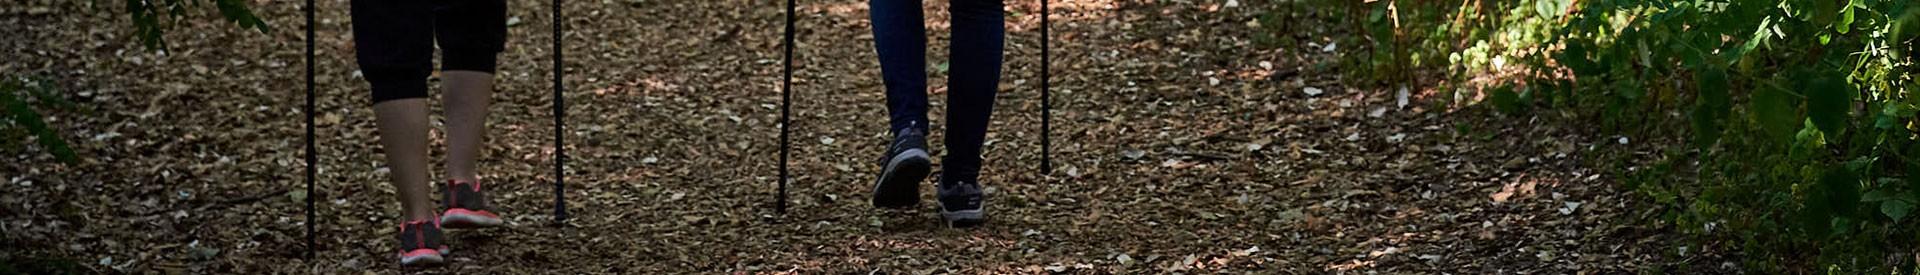 rando-pedestre-1654